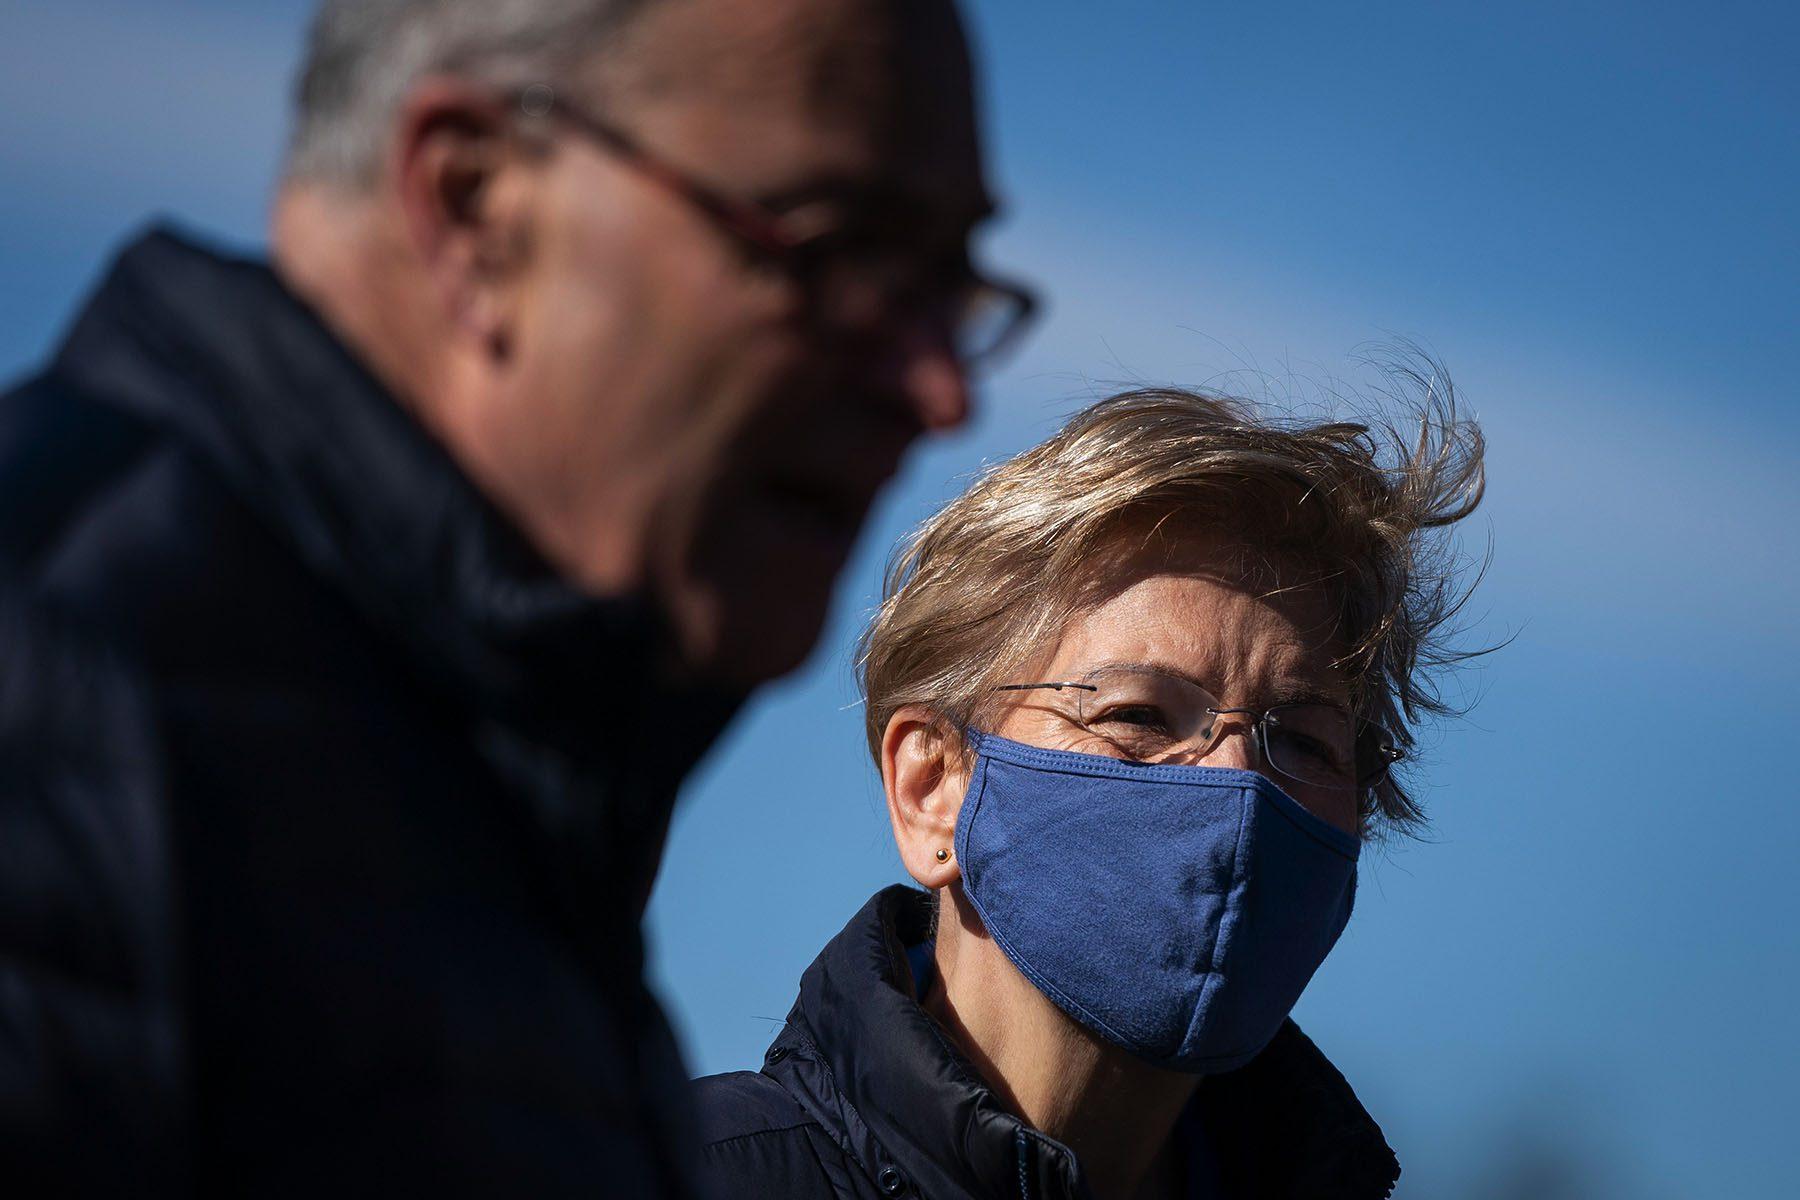 Elizabeth Warren wears a blue face masks and looks on while Chuck Schumer speaks.